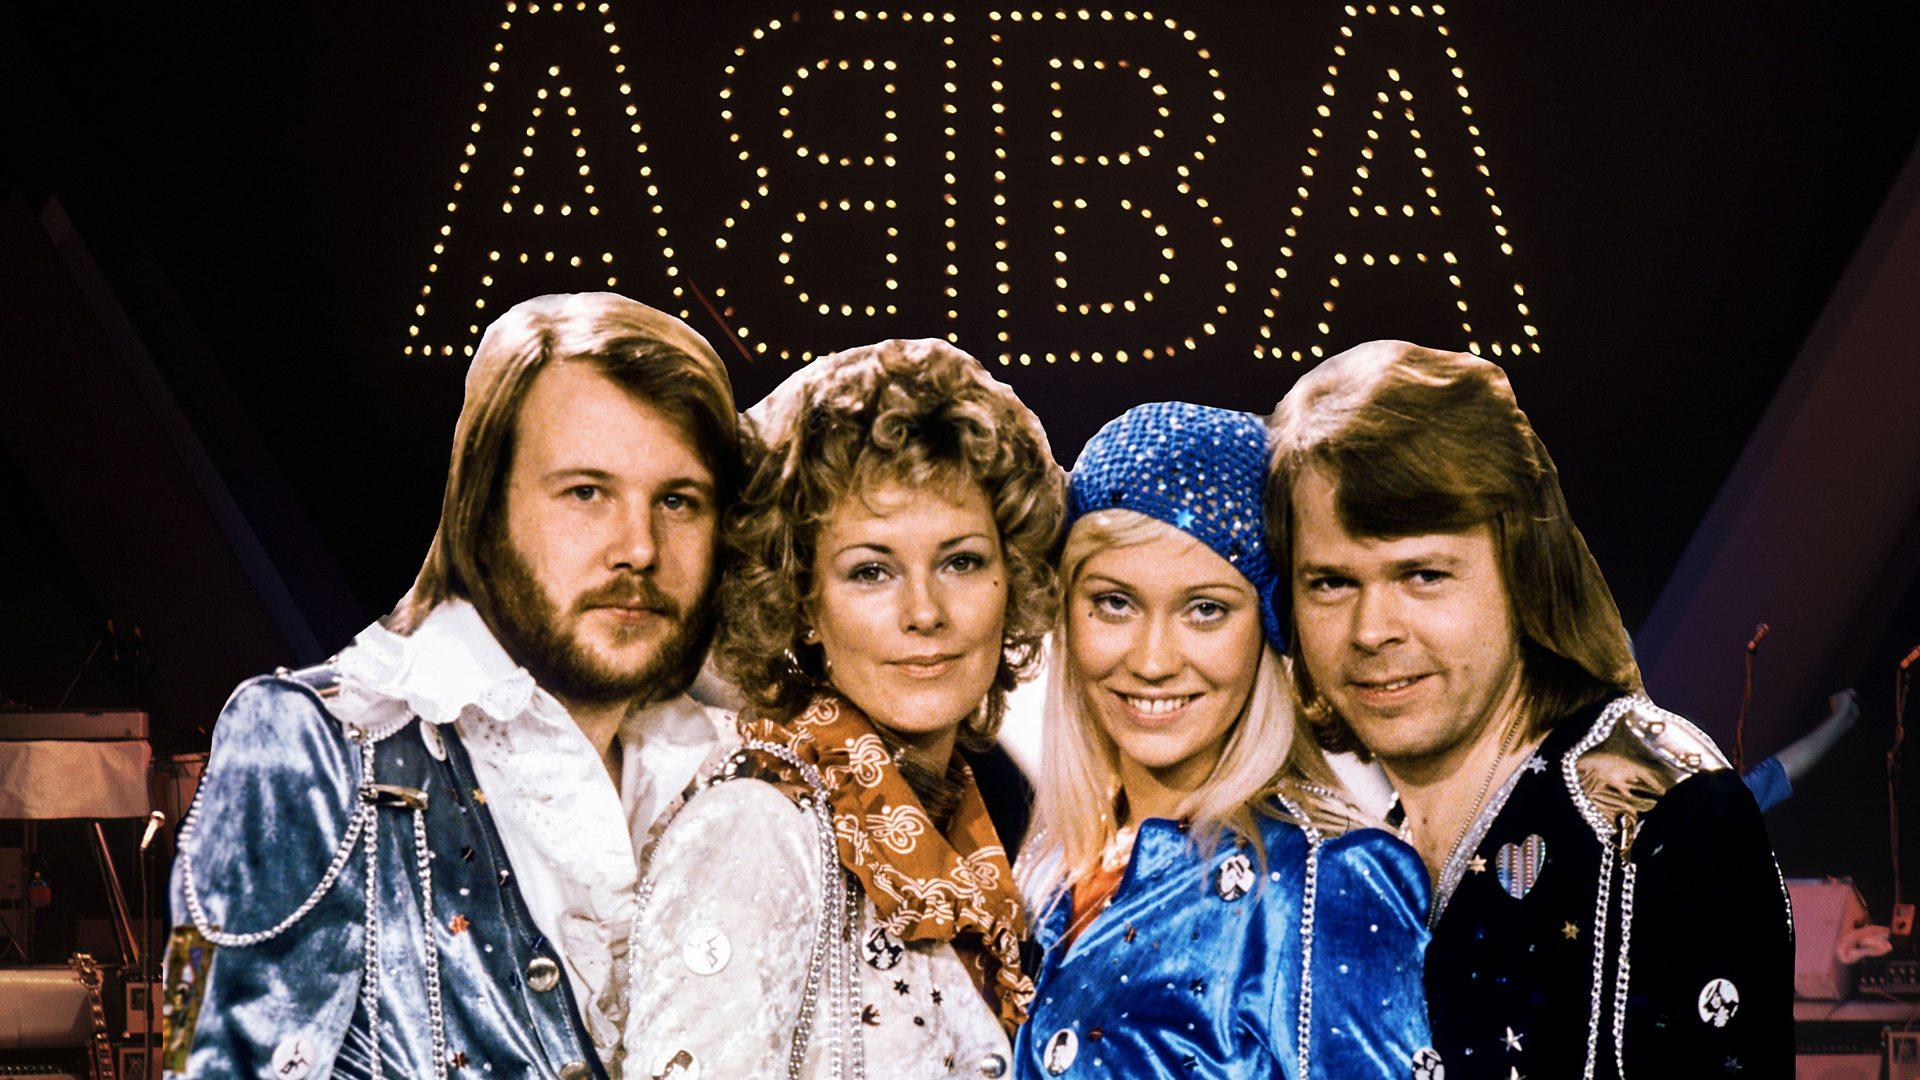 BBC - Let's ABBA Quiz: Take Radio 2's ultimate test of ABBA trivia